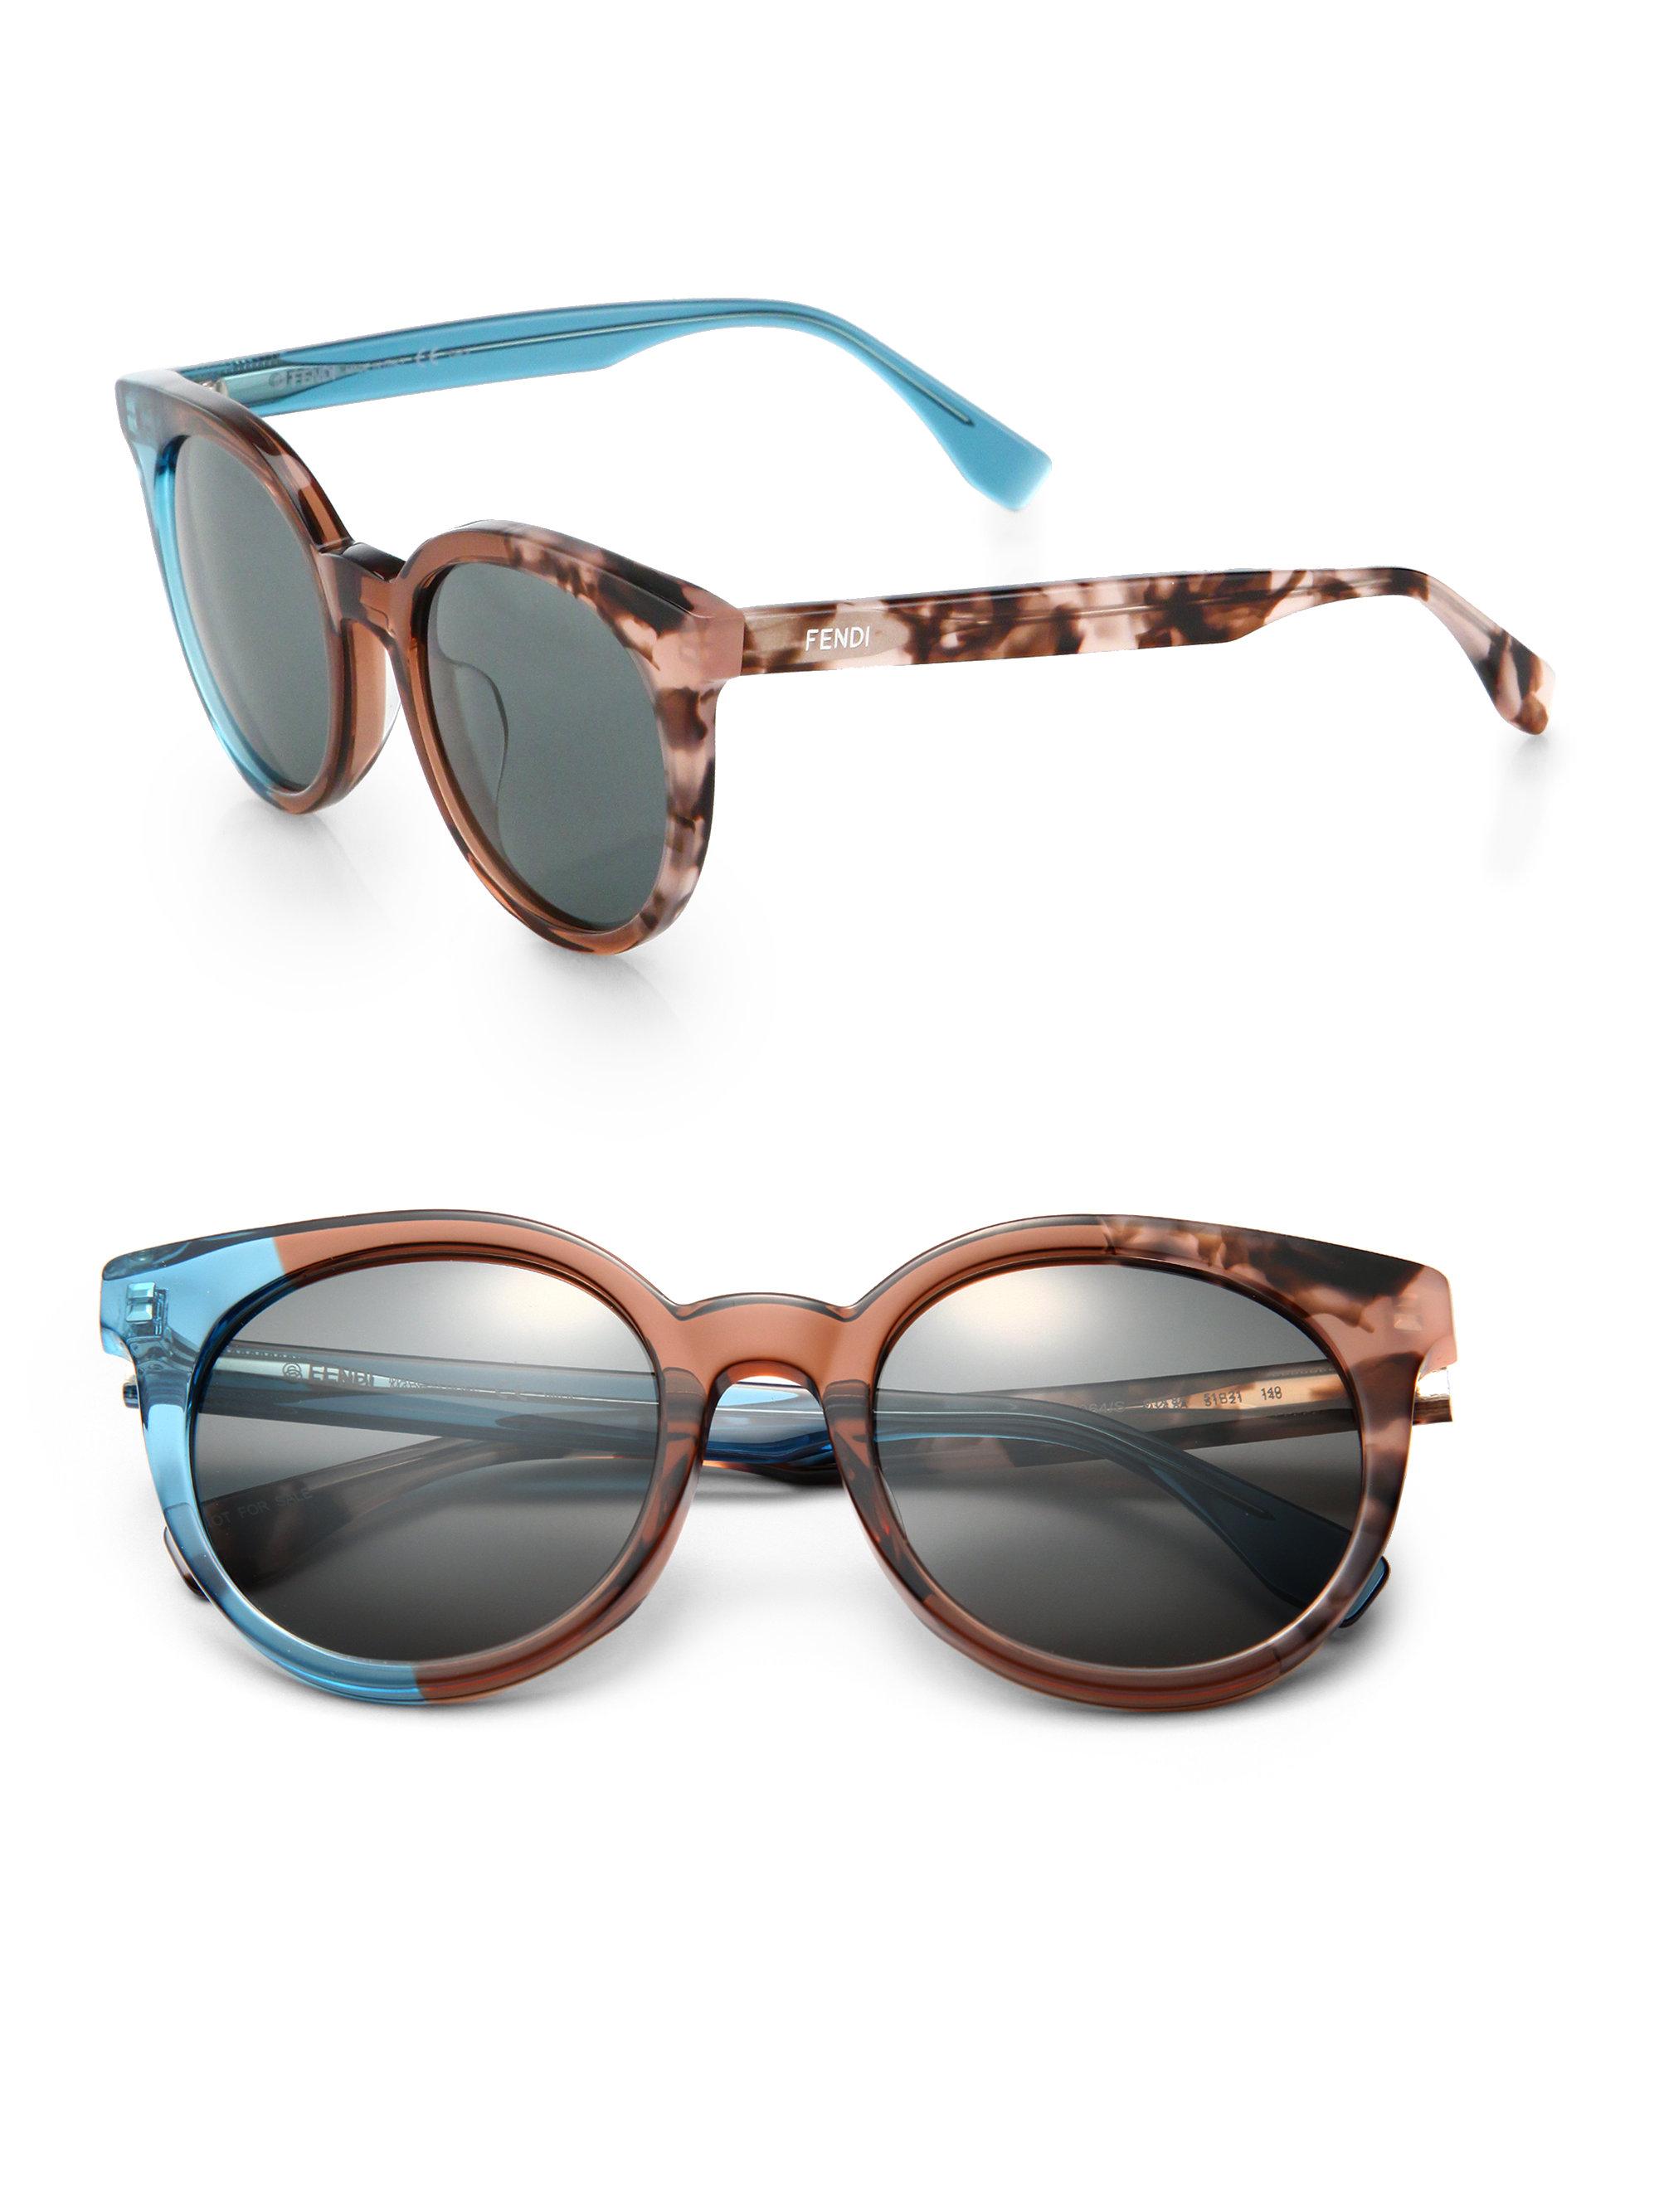 20bbafd9b8716 Fendi Colorblock Sunglasses